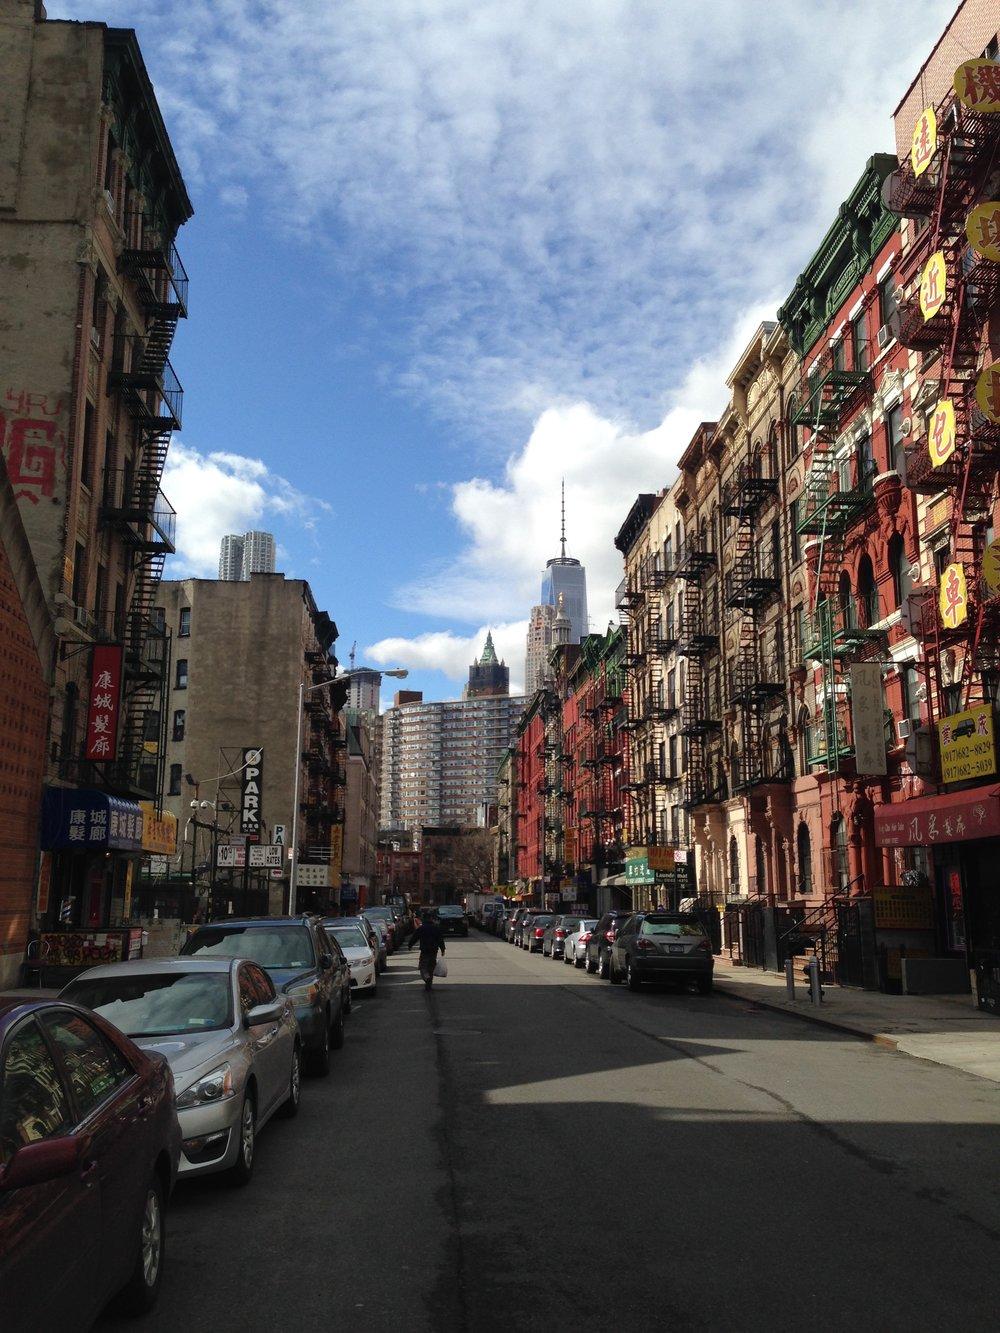 street-chinatown-twobridges-nyc-beltran.jpg